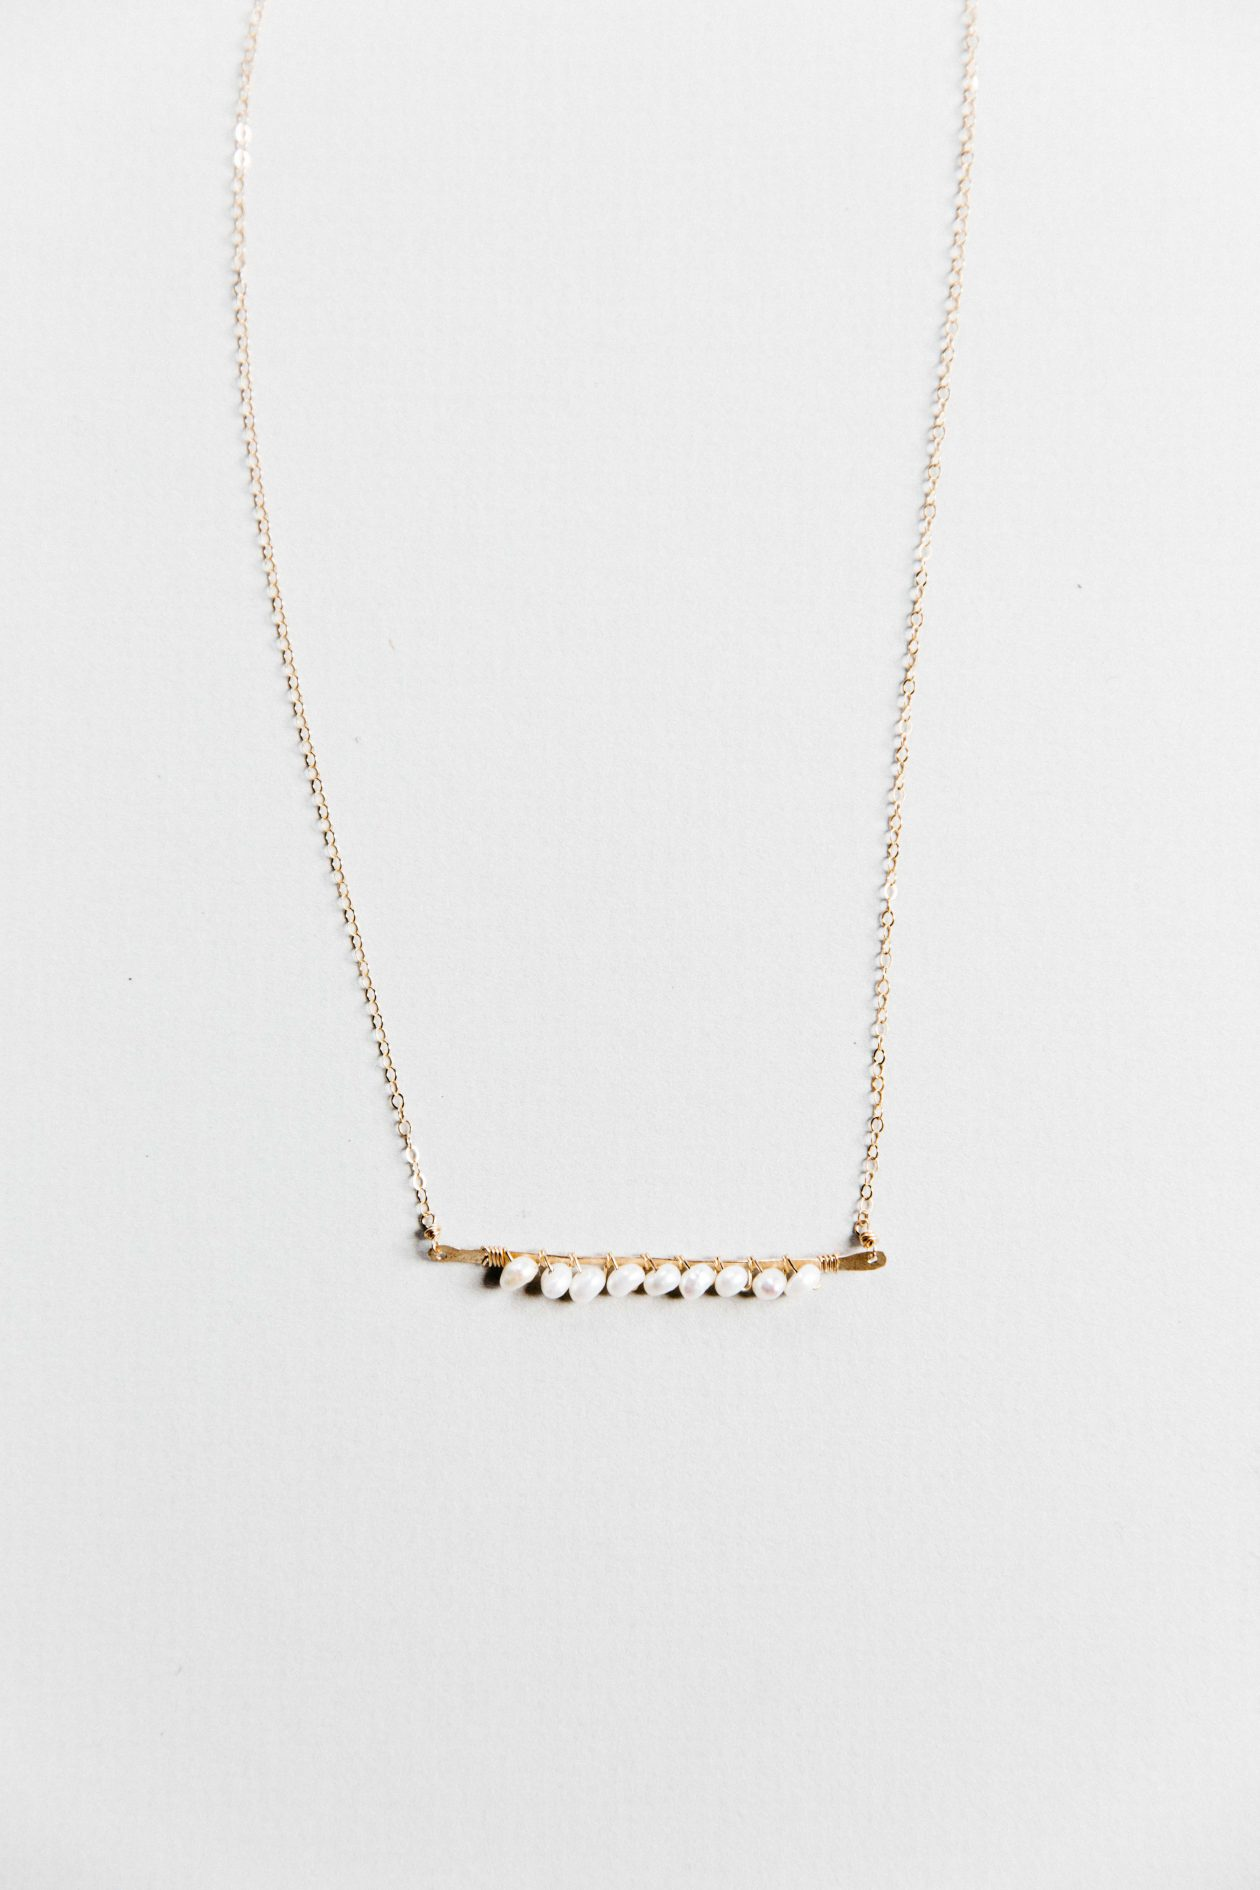 Style N8 JK Designs Jewelry